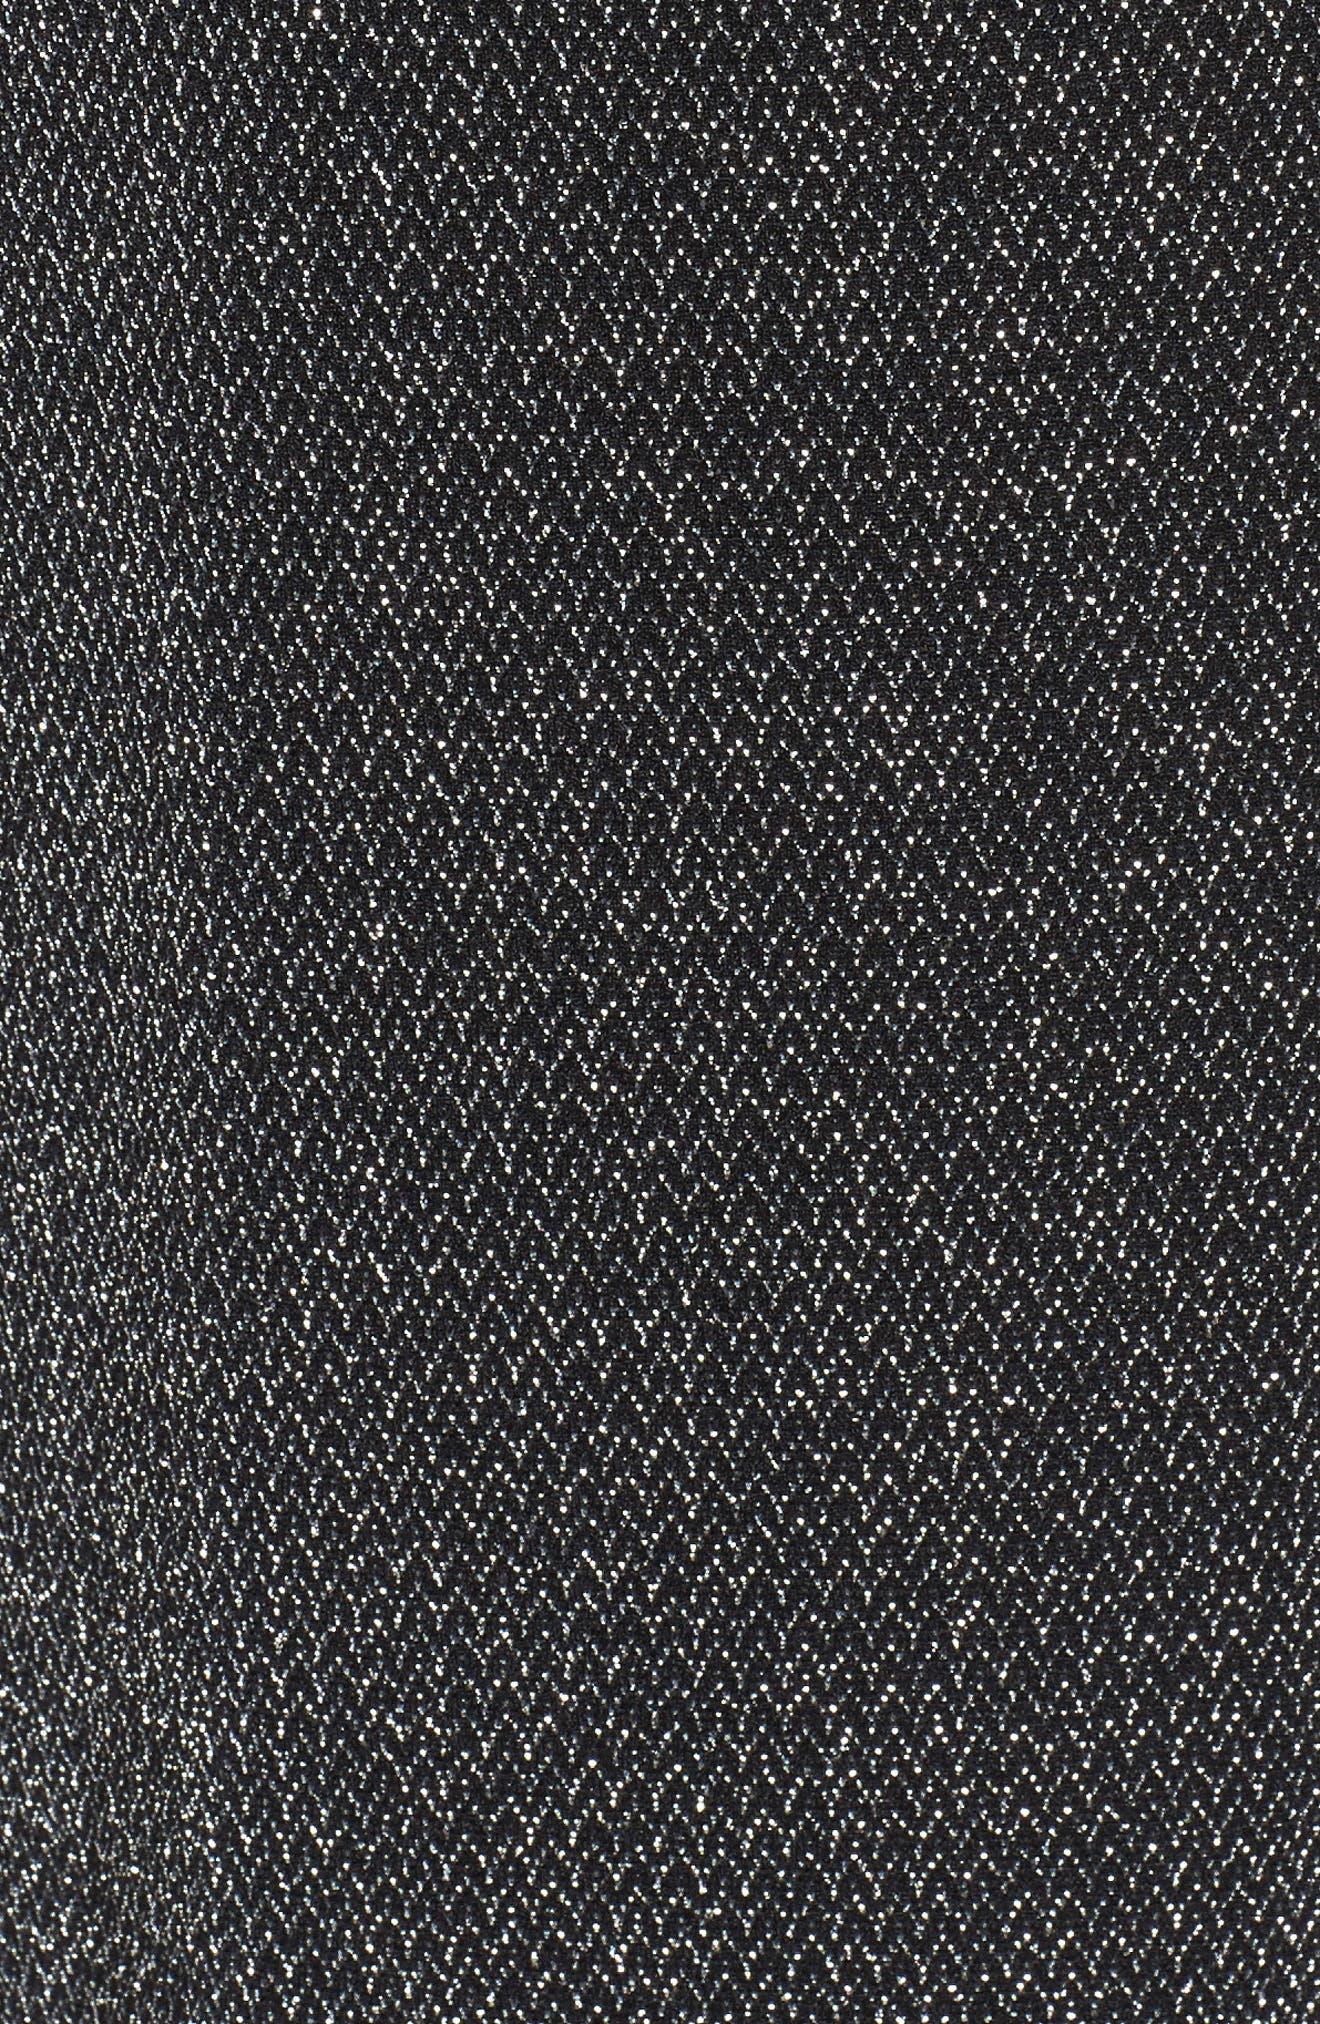 Metallic Knit Jumpsuit,                             Alternate thumbnail 5, color,                             Black/ Silver